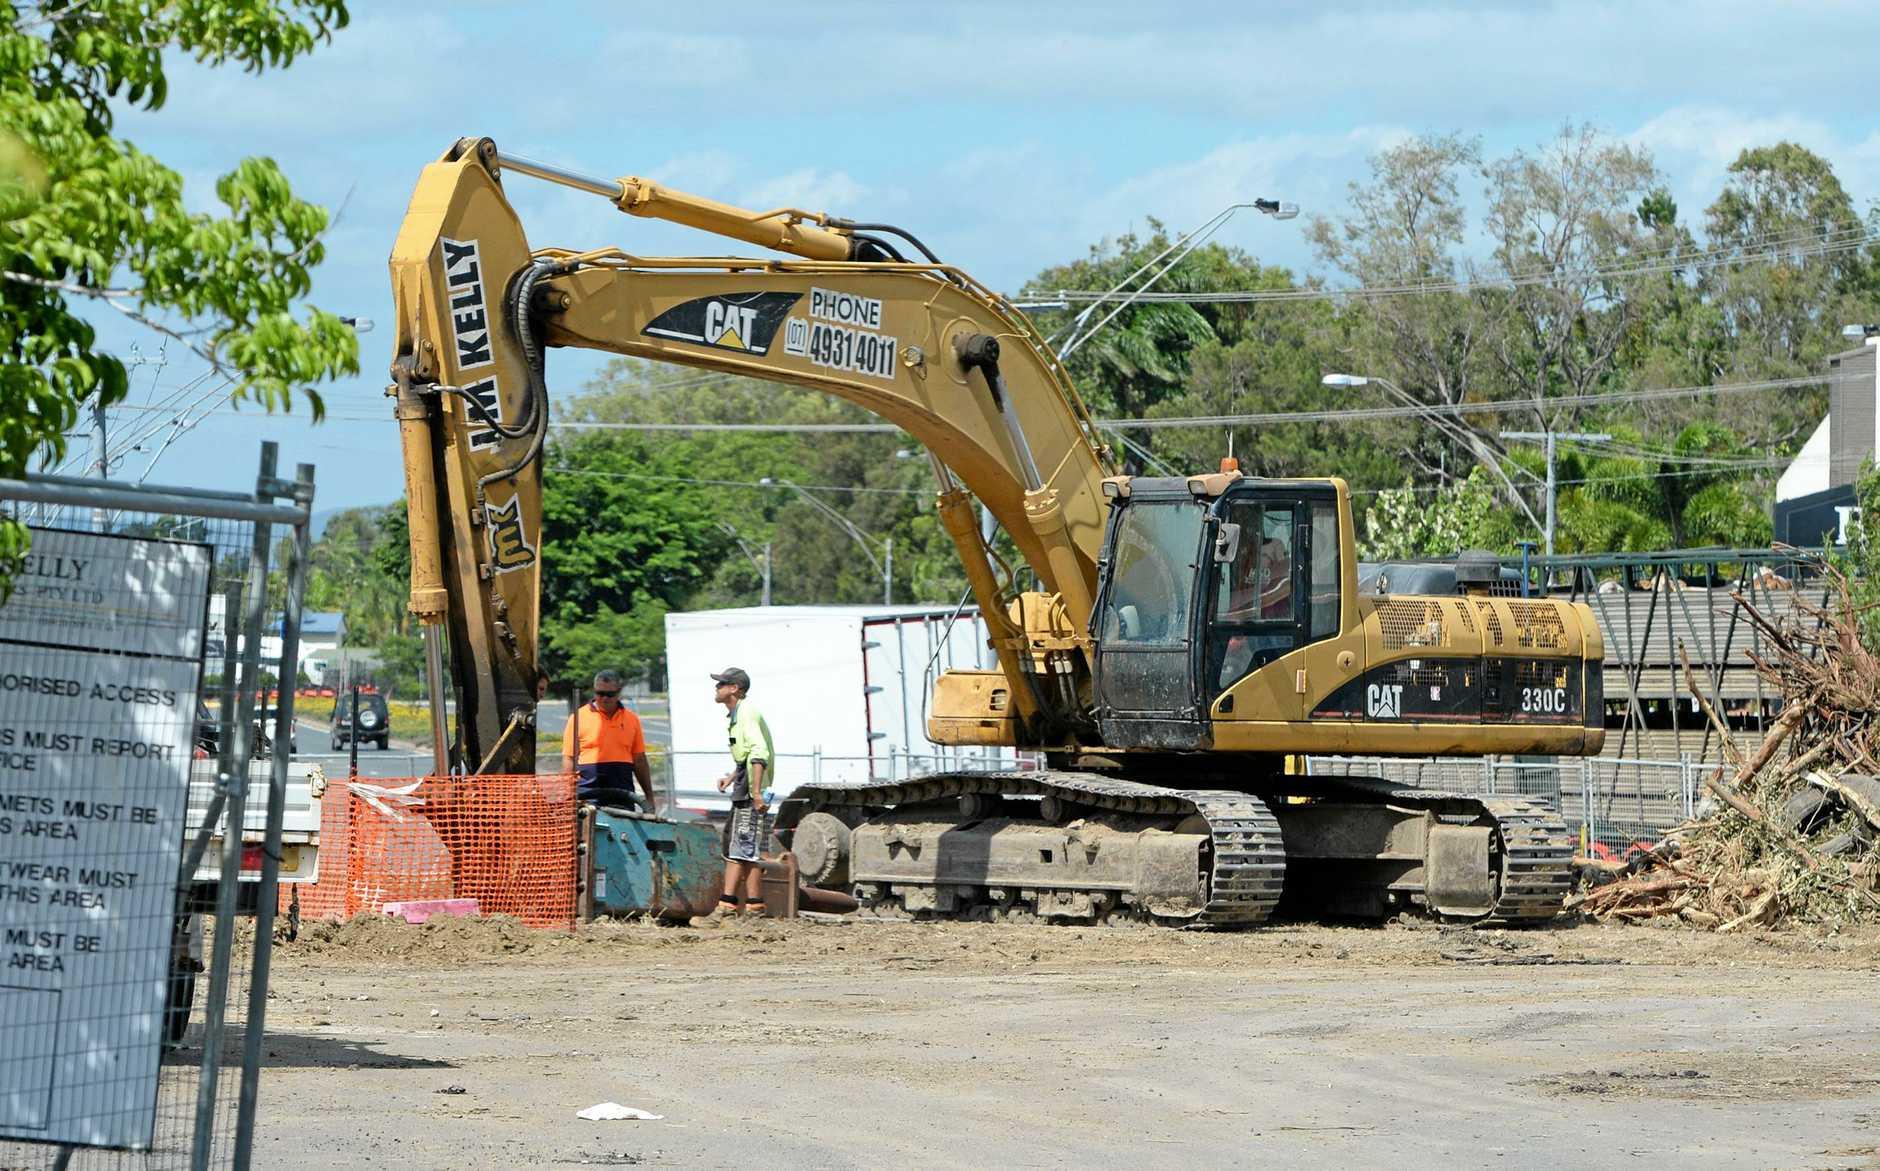 Aldi construction site on Gladstone Rd, Rockhampton.